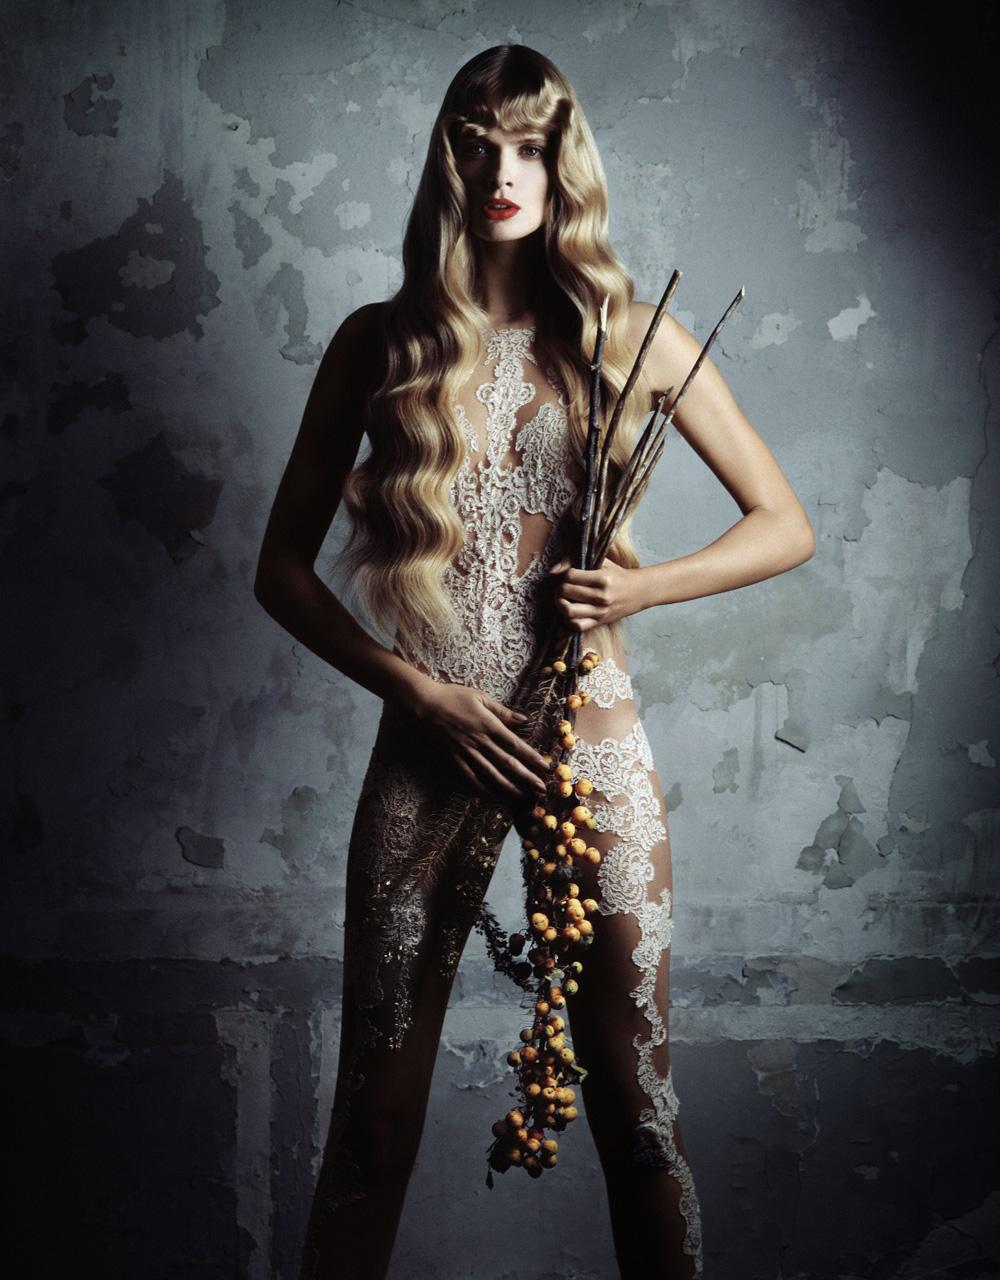 julia-stegner-by-daniele-duella-iango-henzi-for-muse-magazine-winter-2010-4.jpg